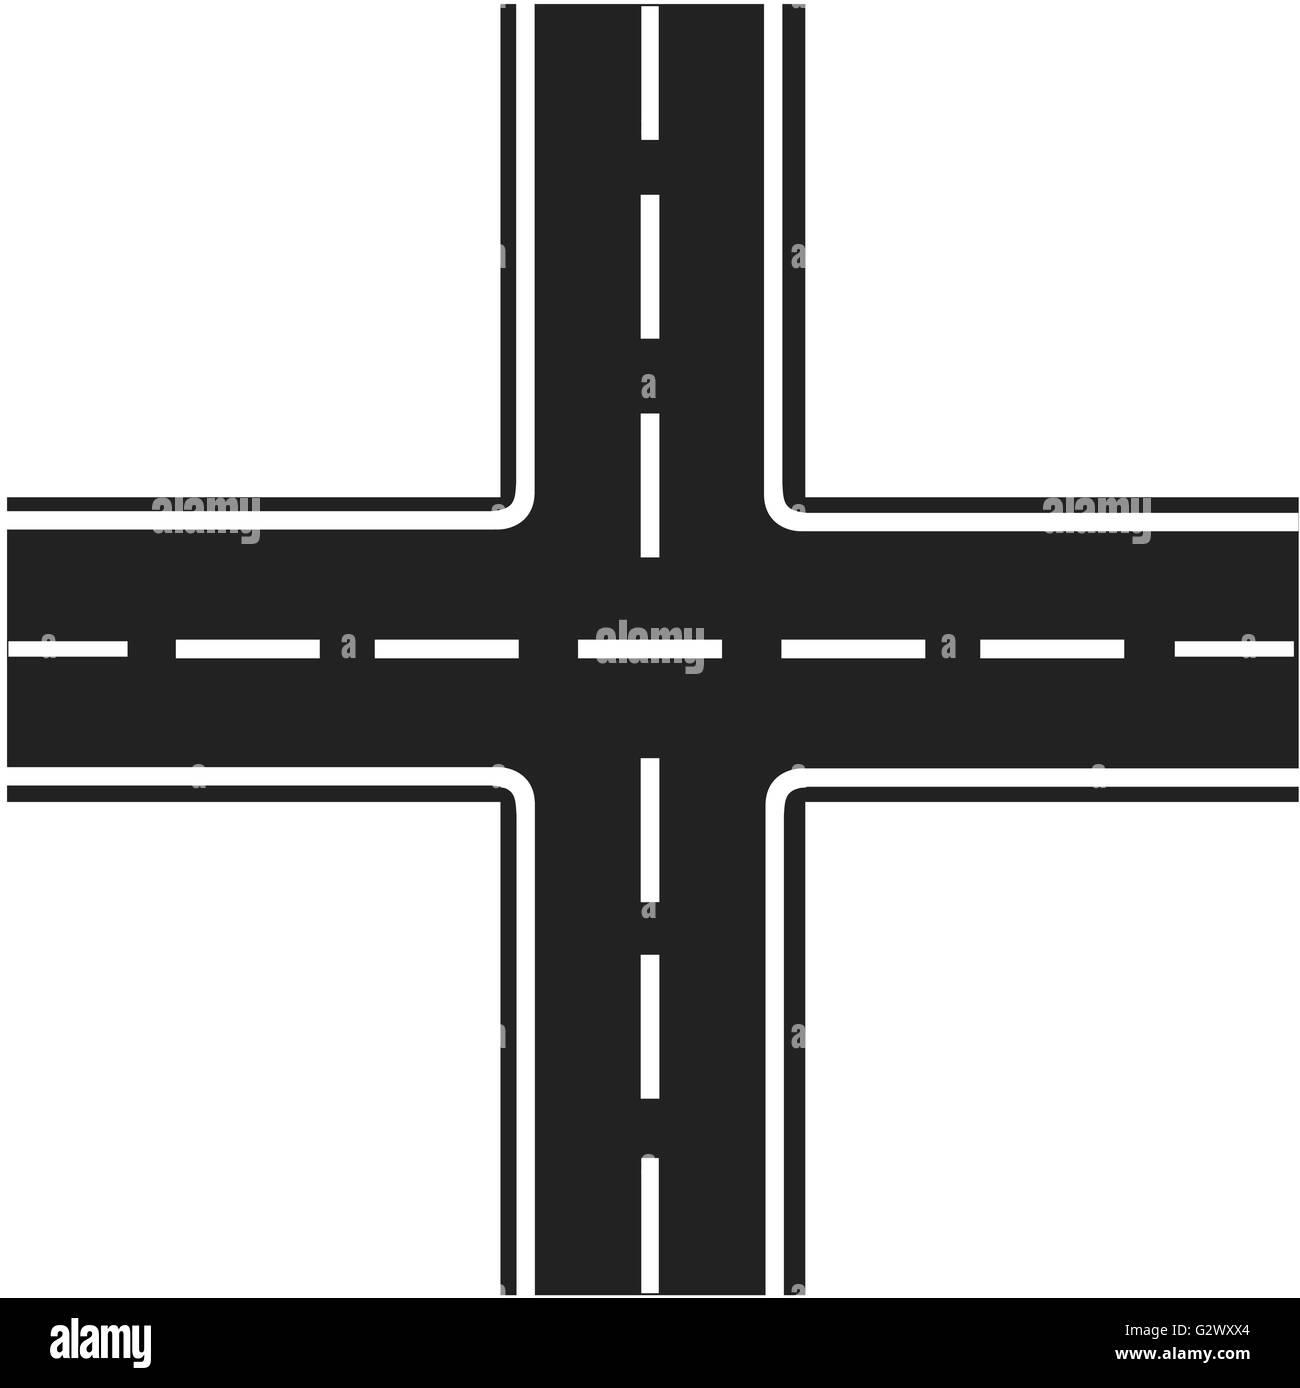 road junction illustration crossroads highway intersection stock